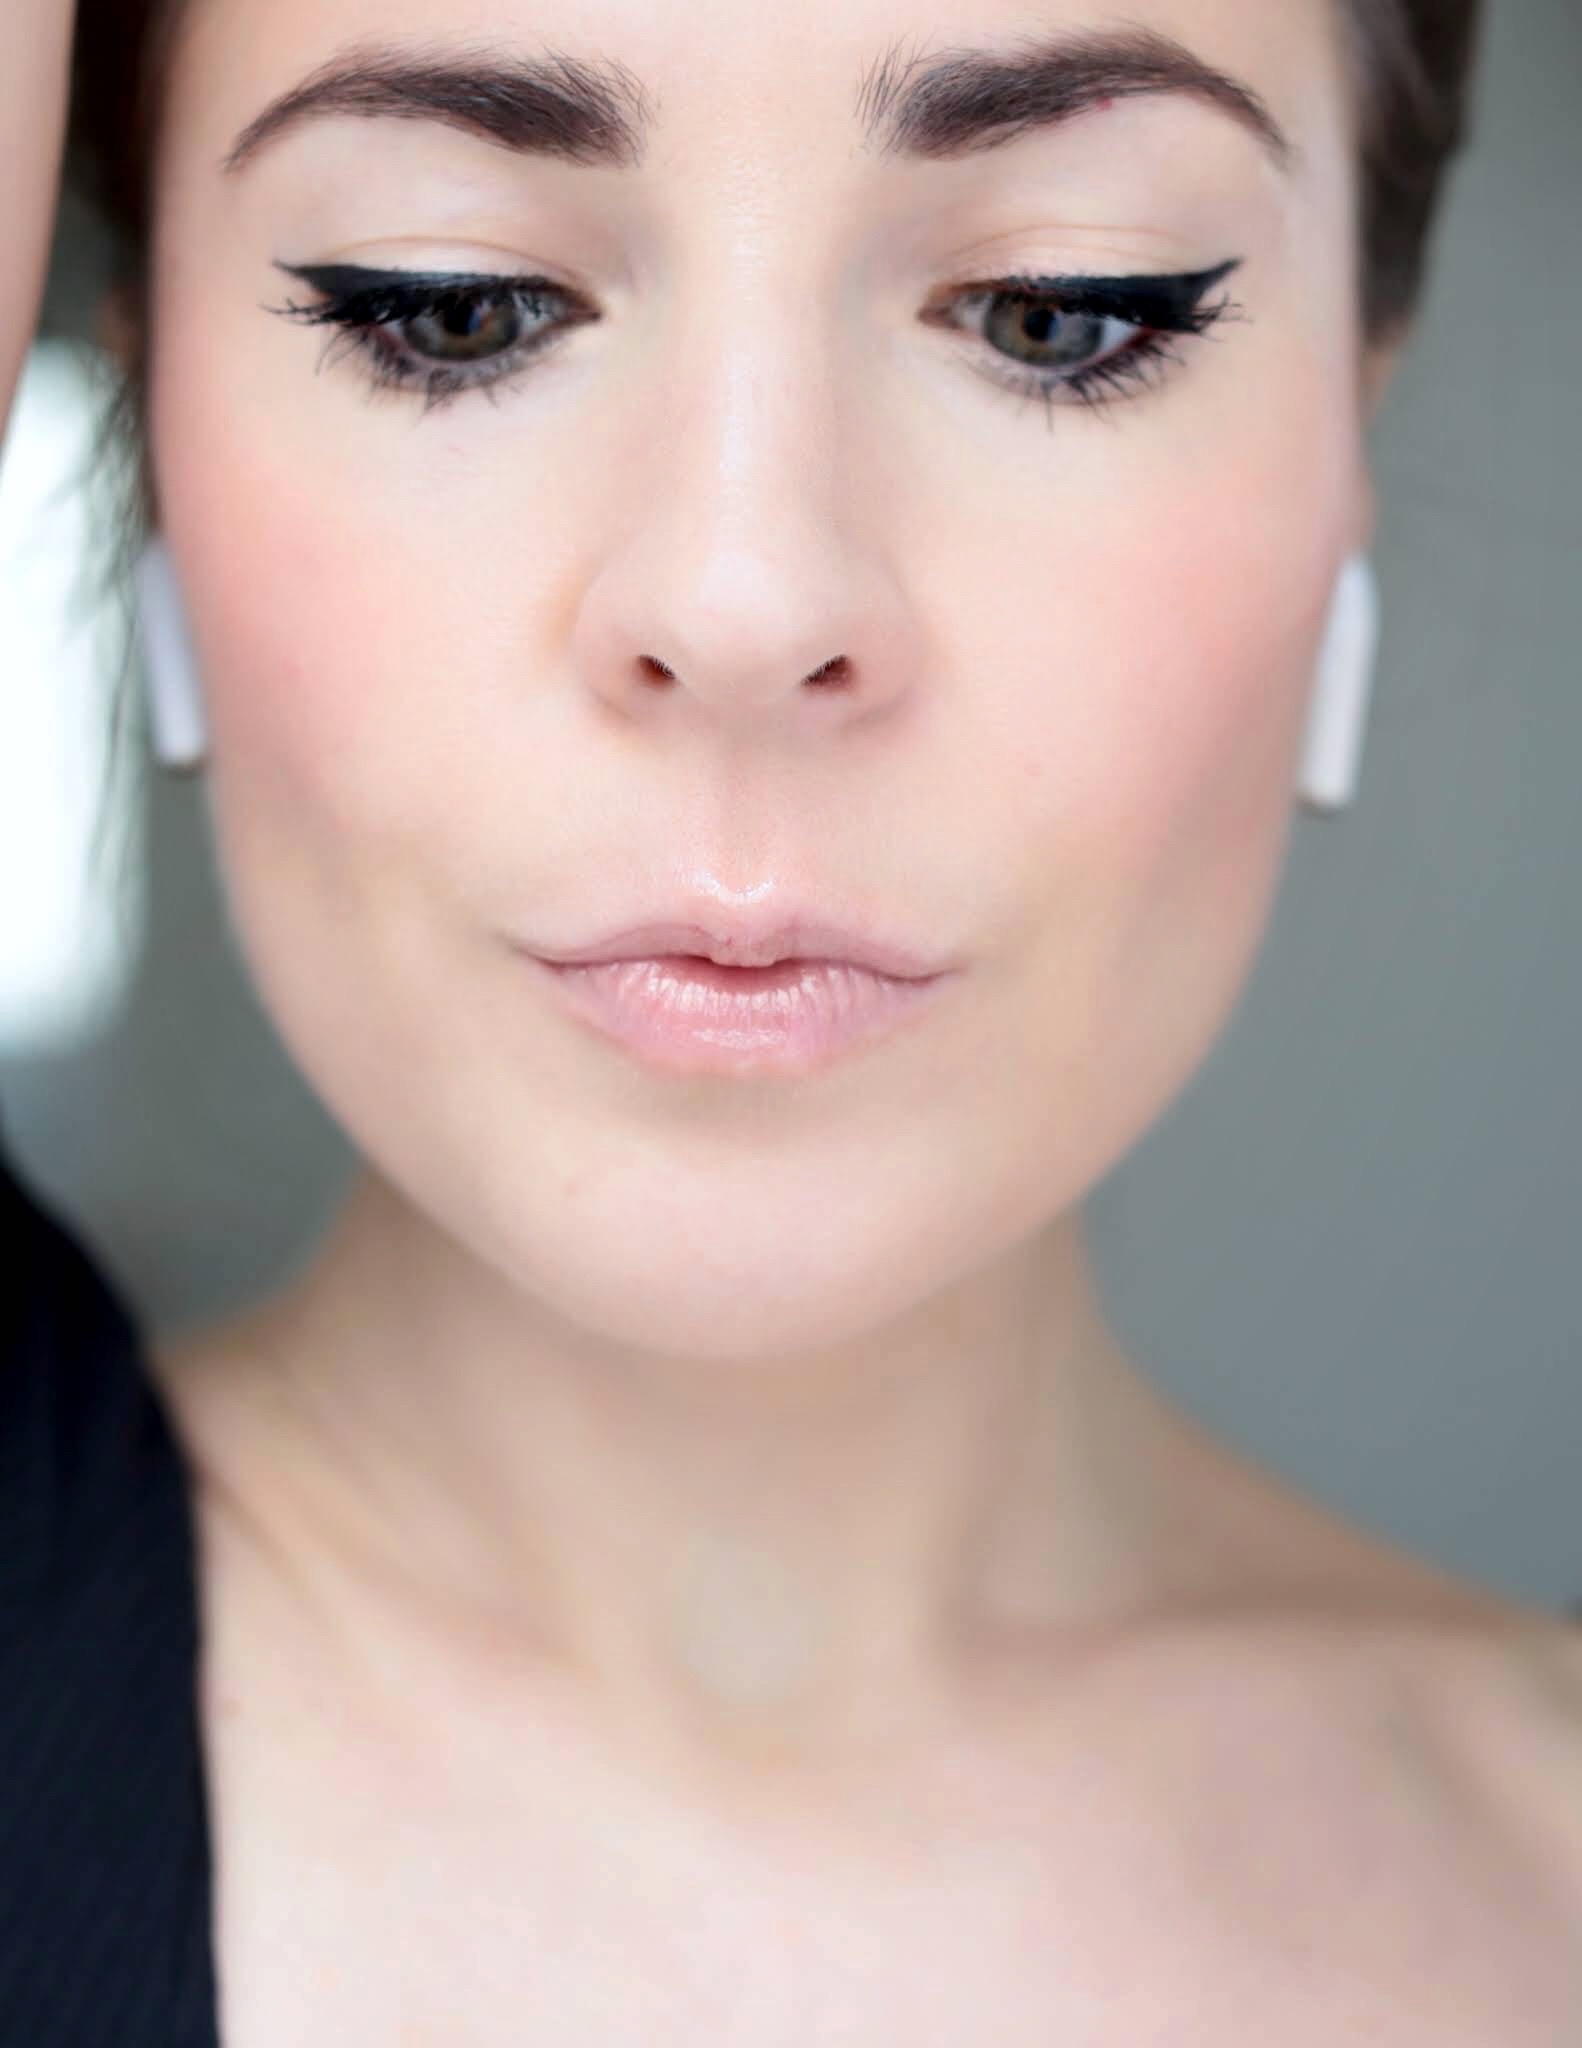 L'Oreal Paris Lash Paradise Mascara Matte Signature Eyeliner